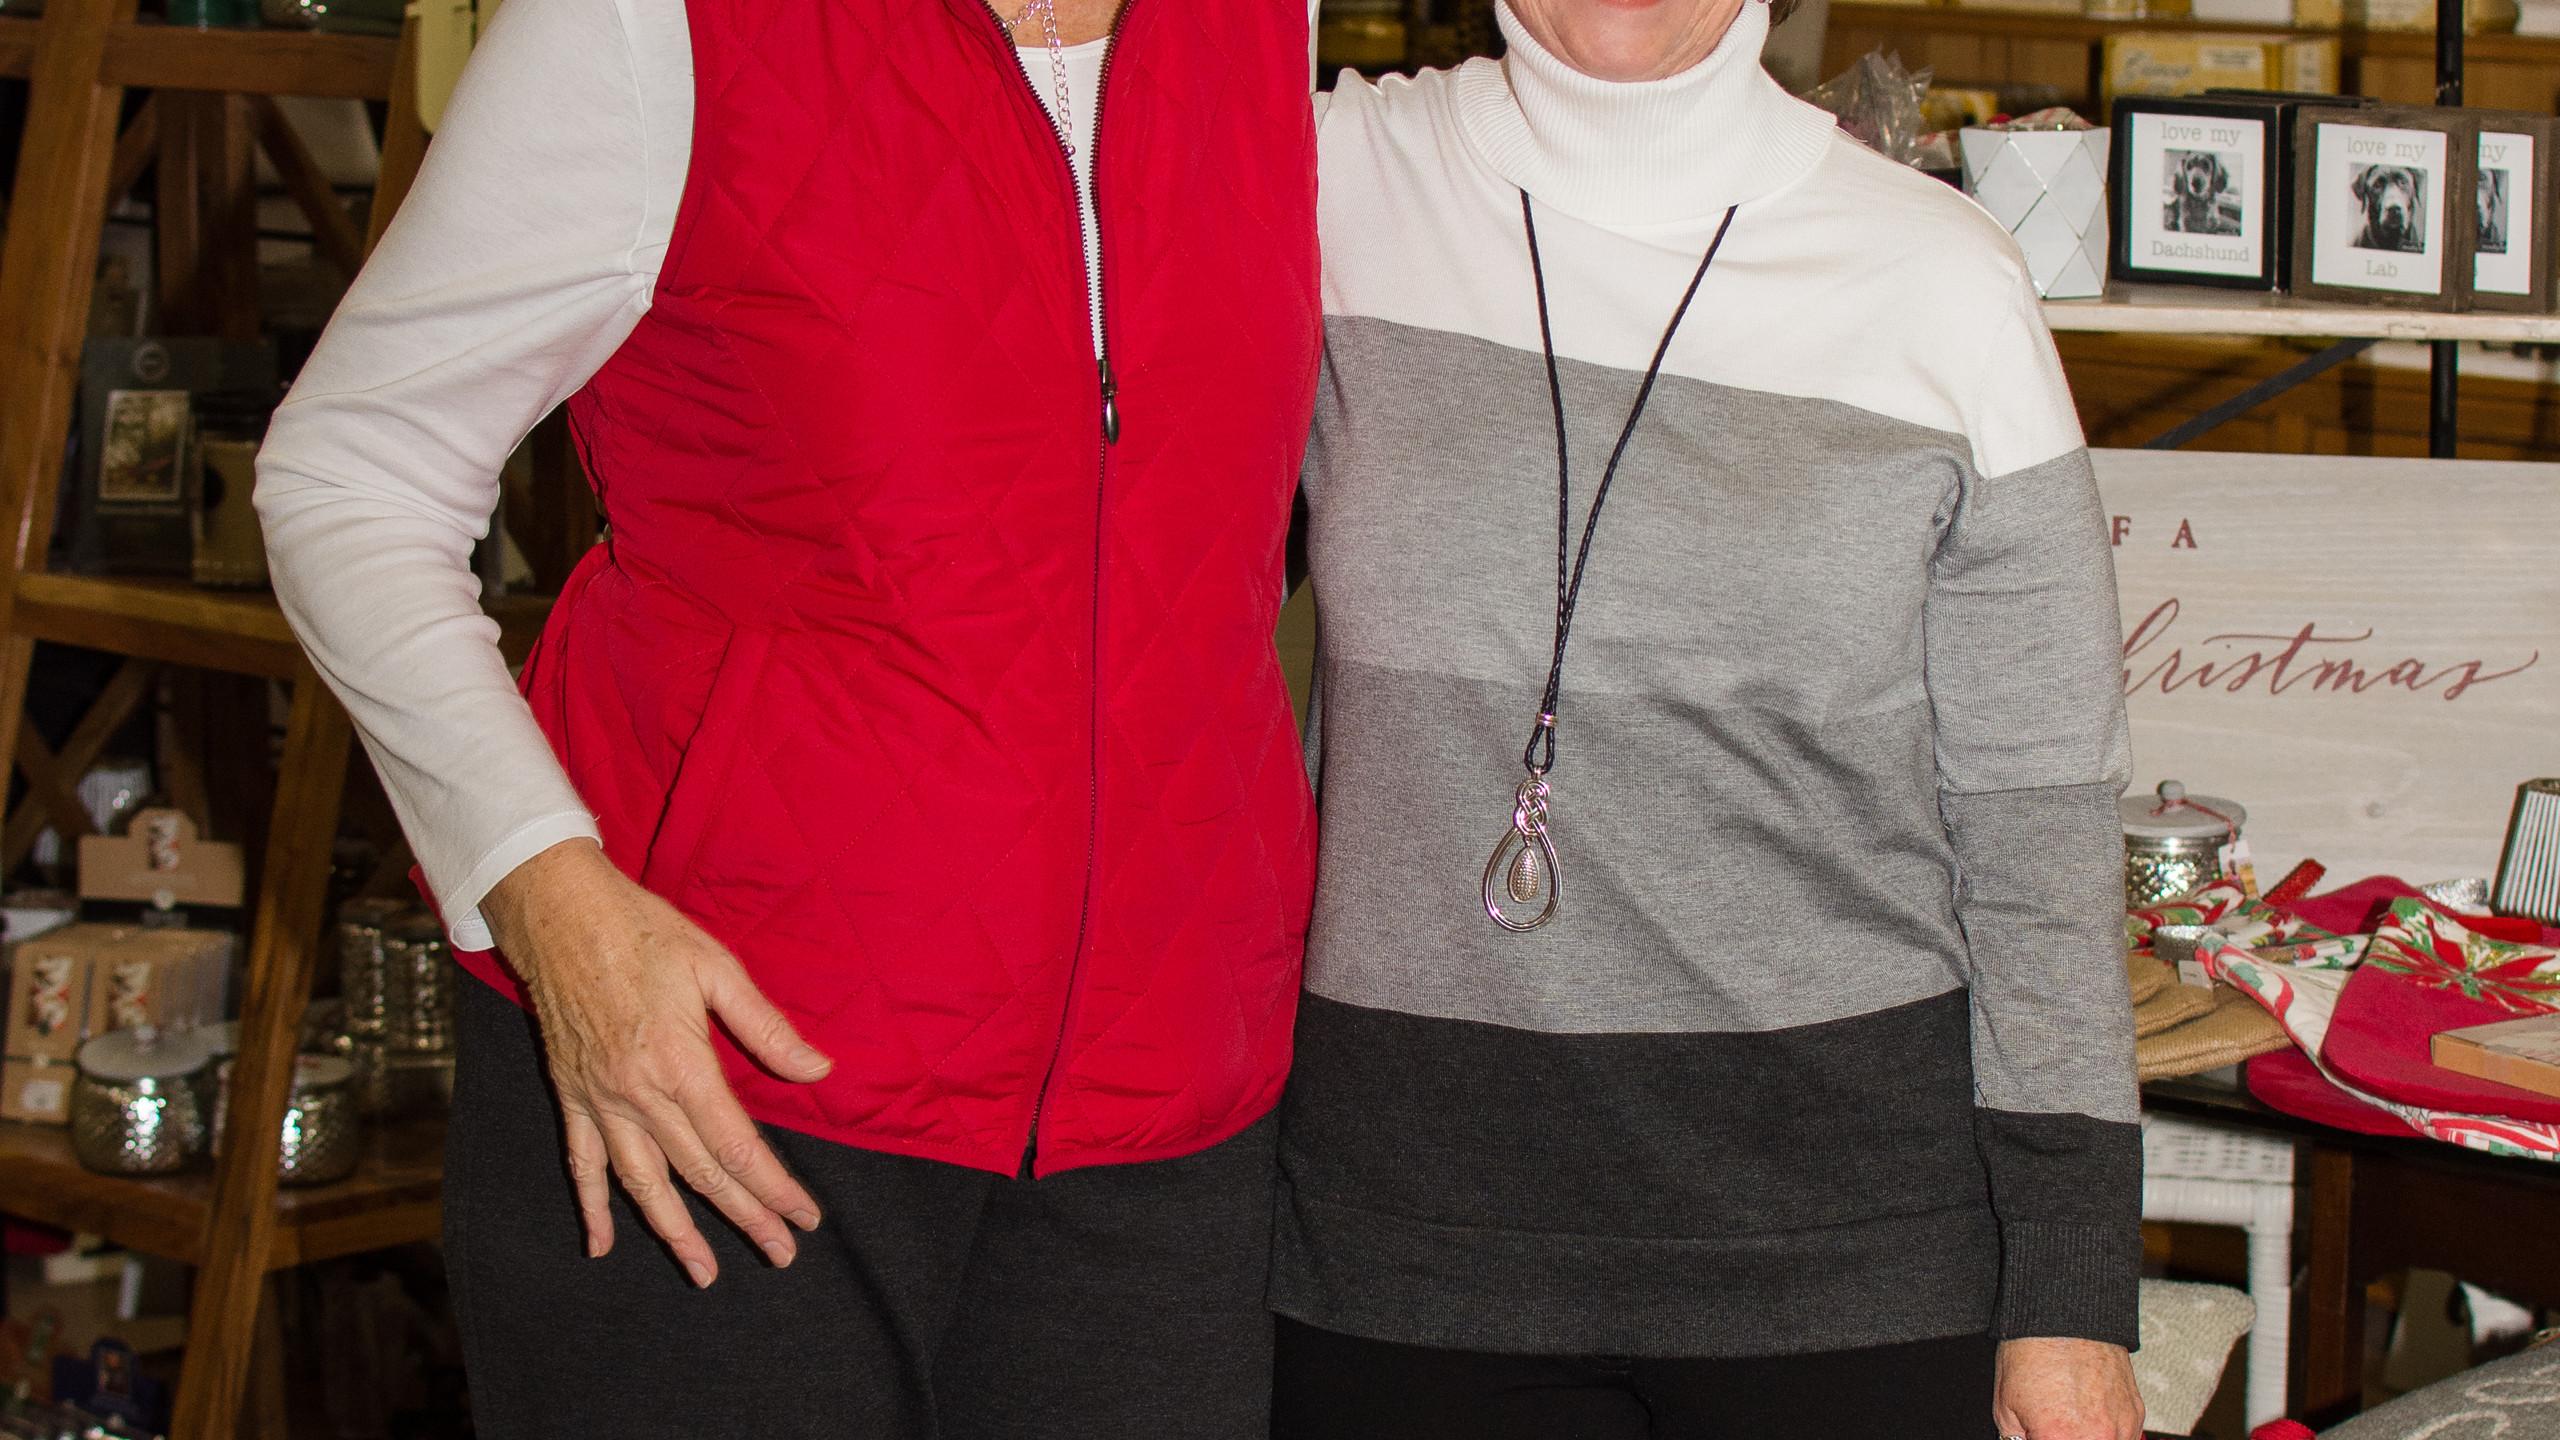 Brenda Douglas and Brenda Manseill